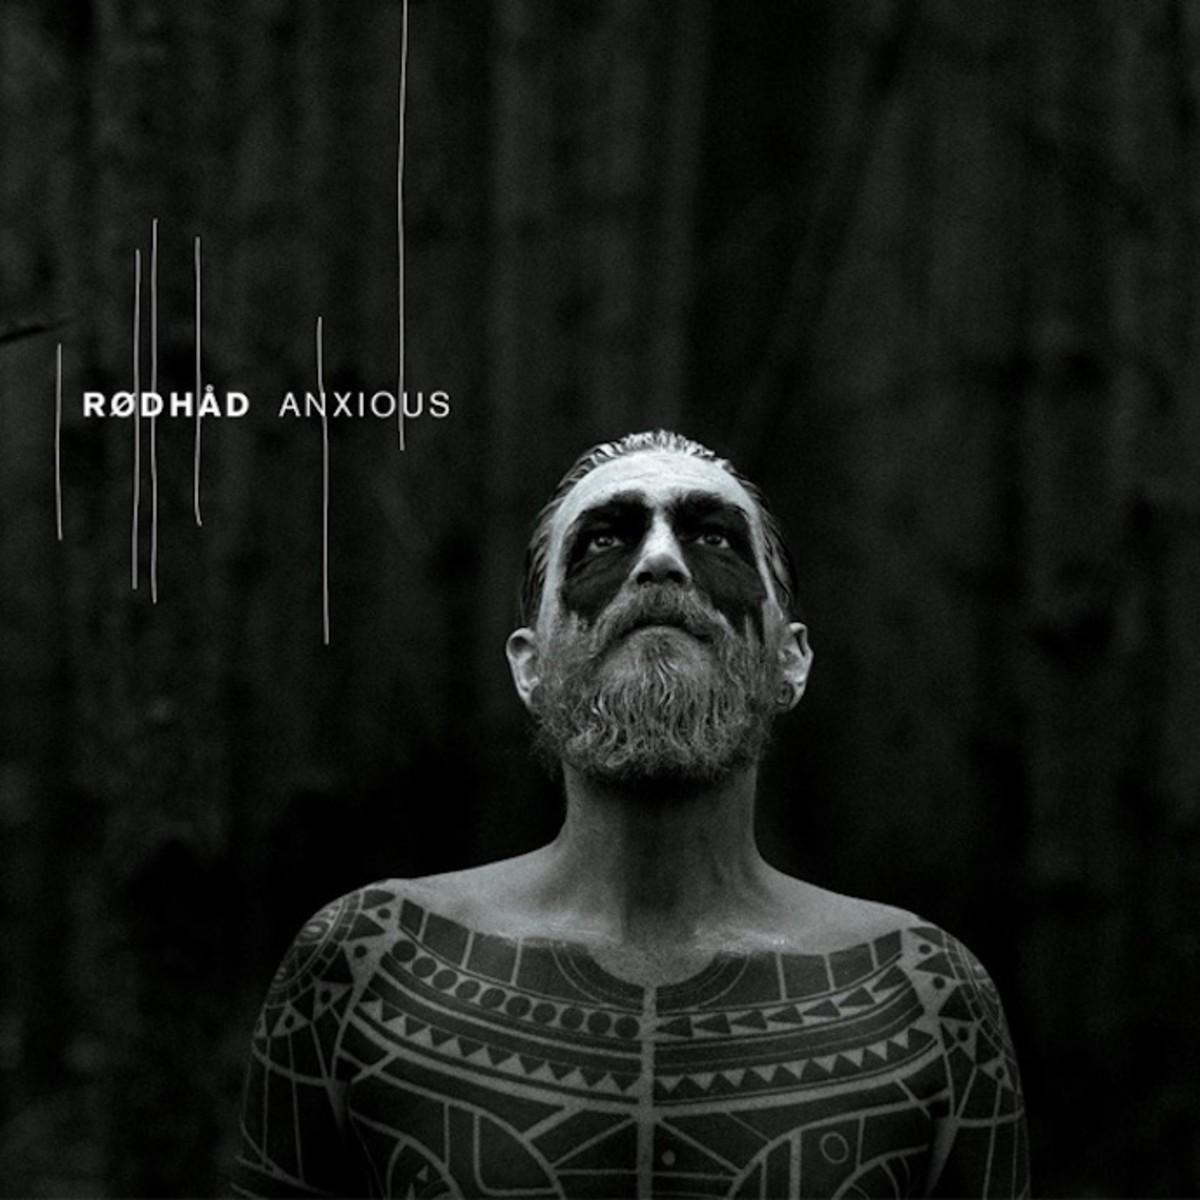 Rodhad Anxious